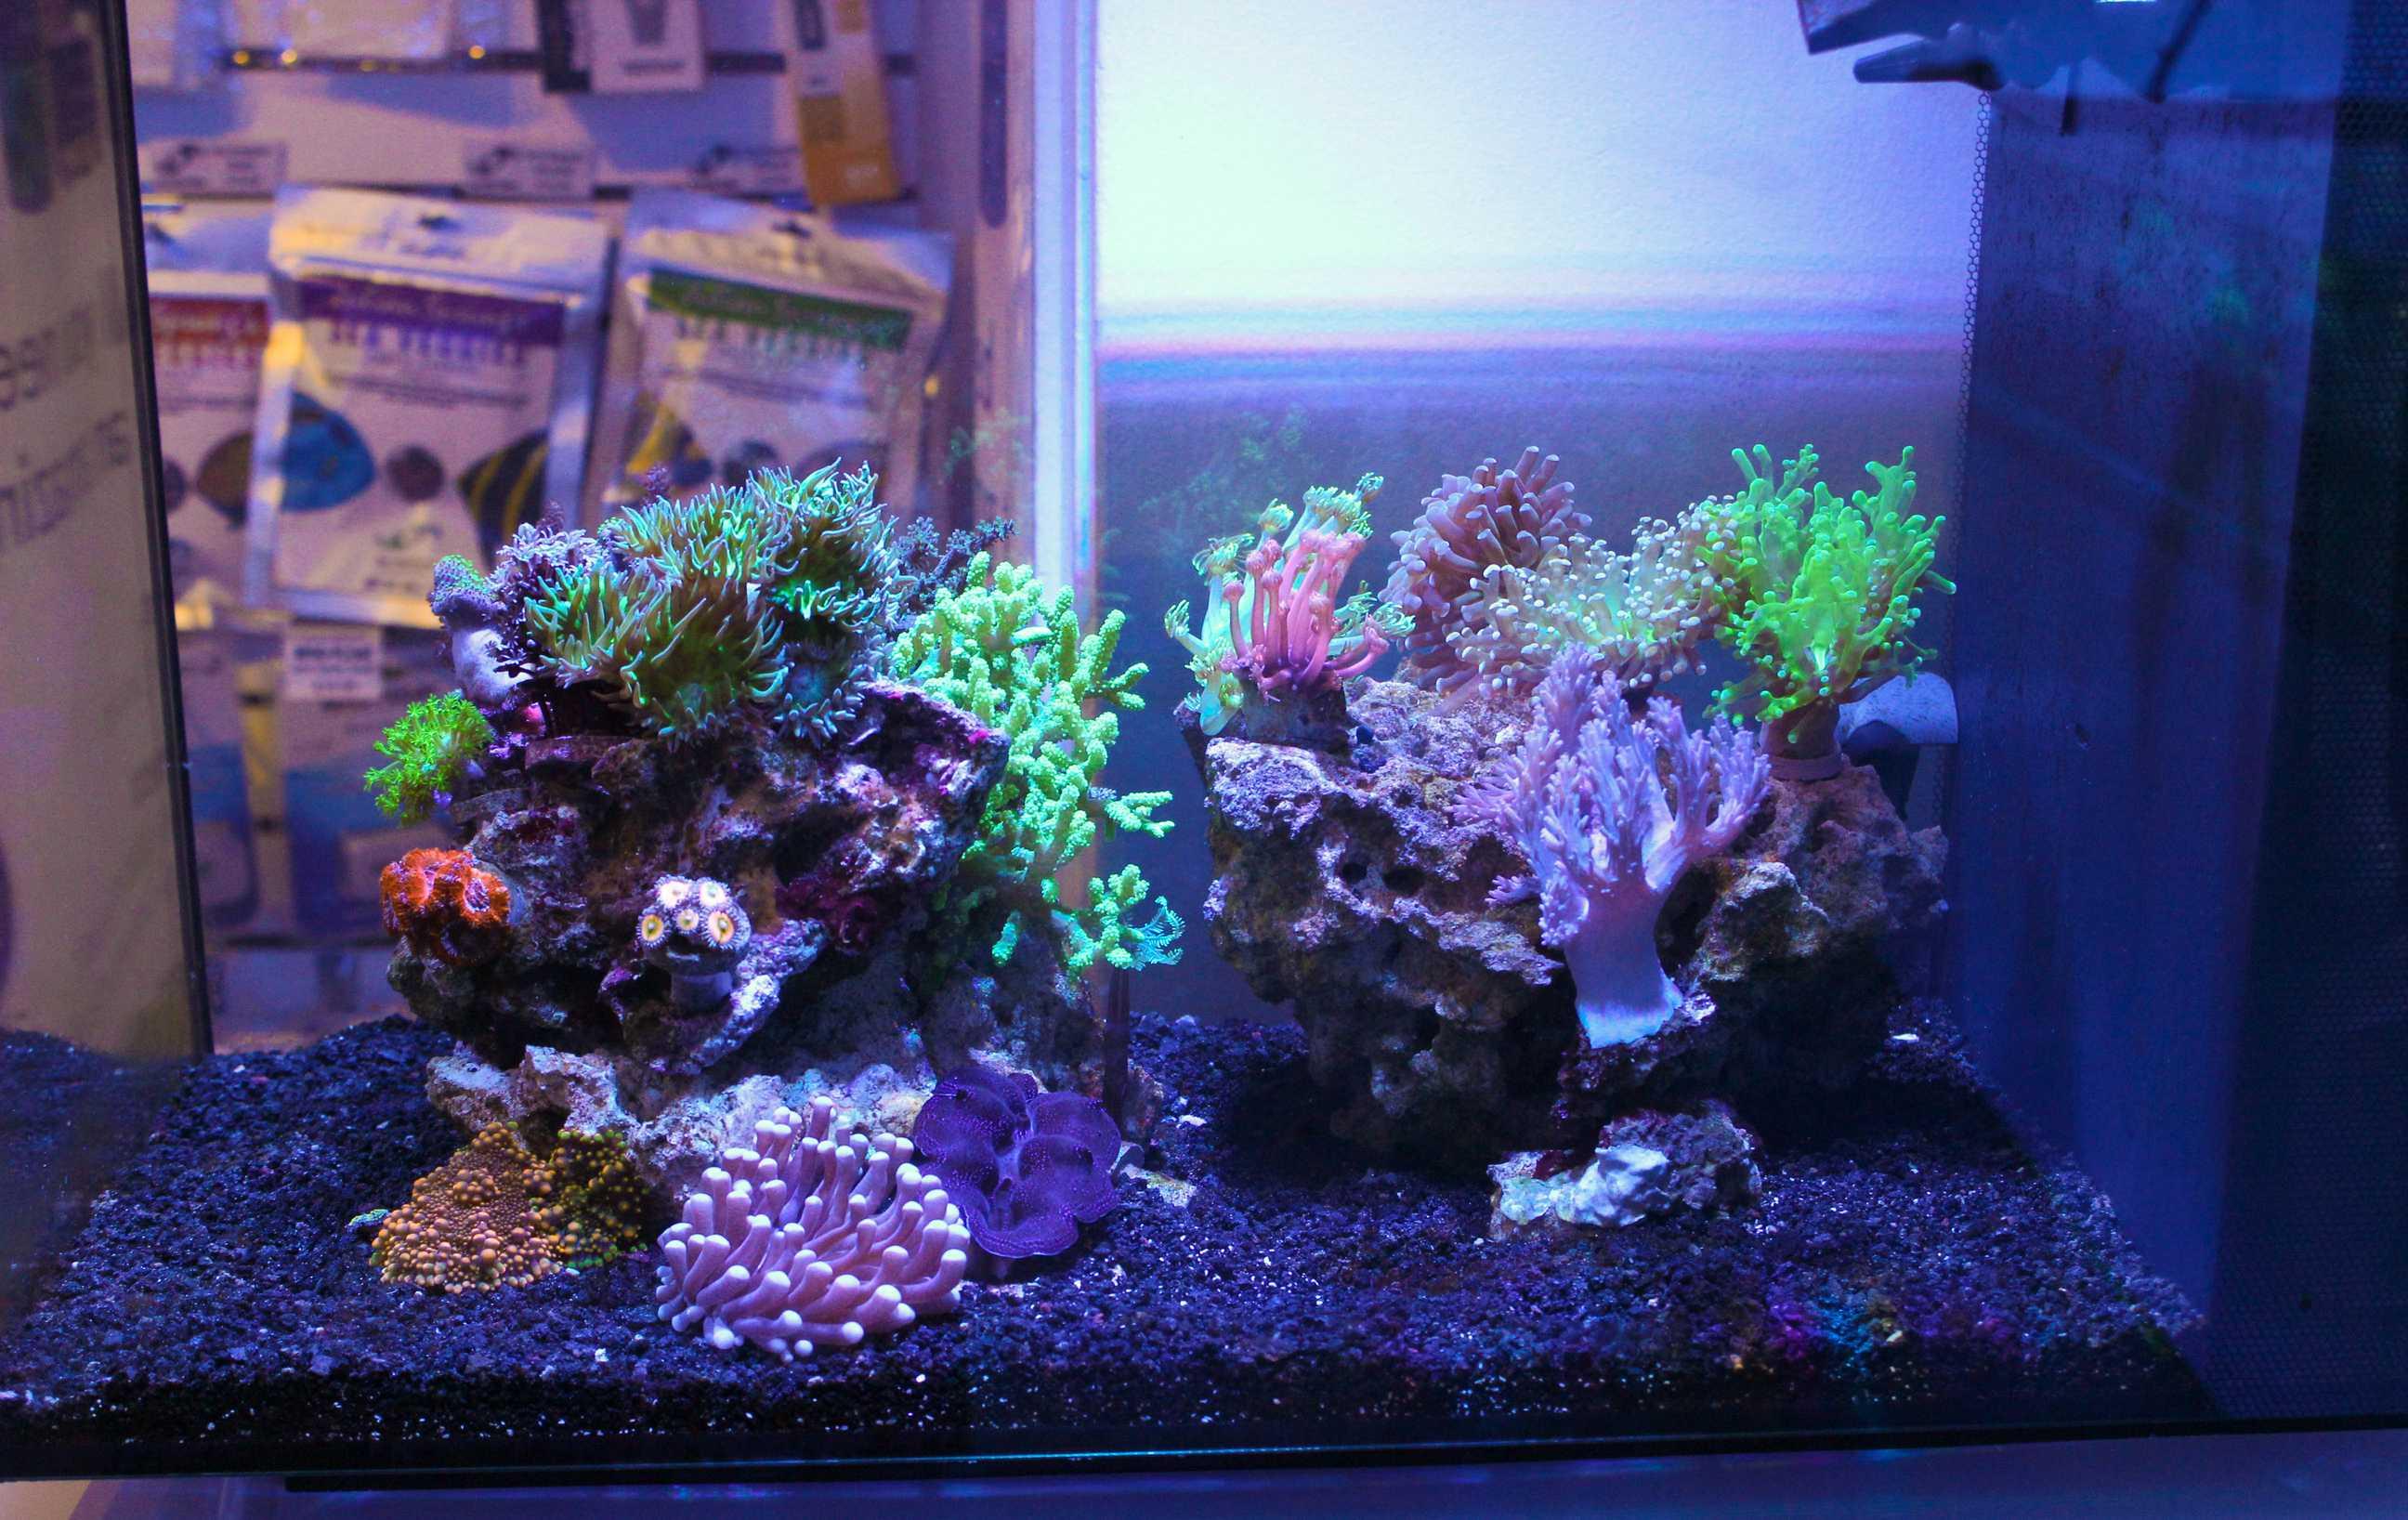 Fluval evo reef tank